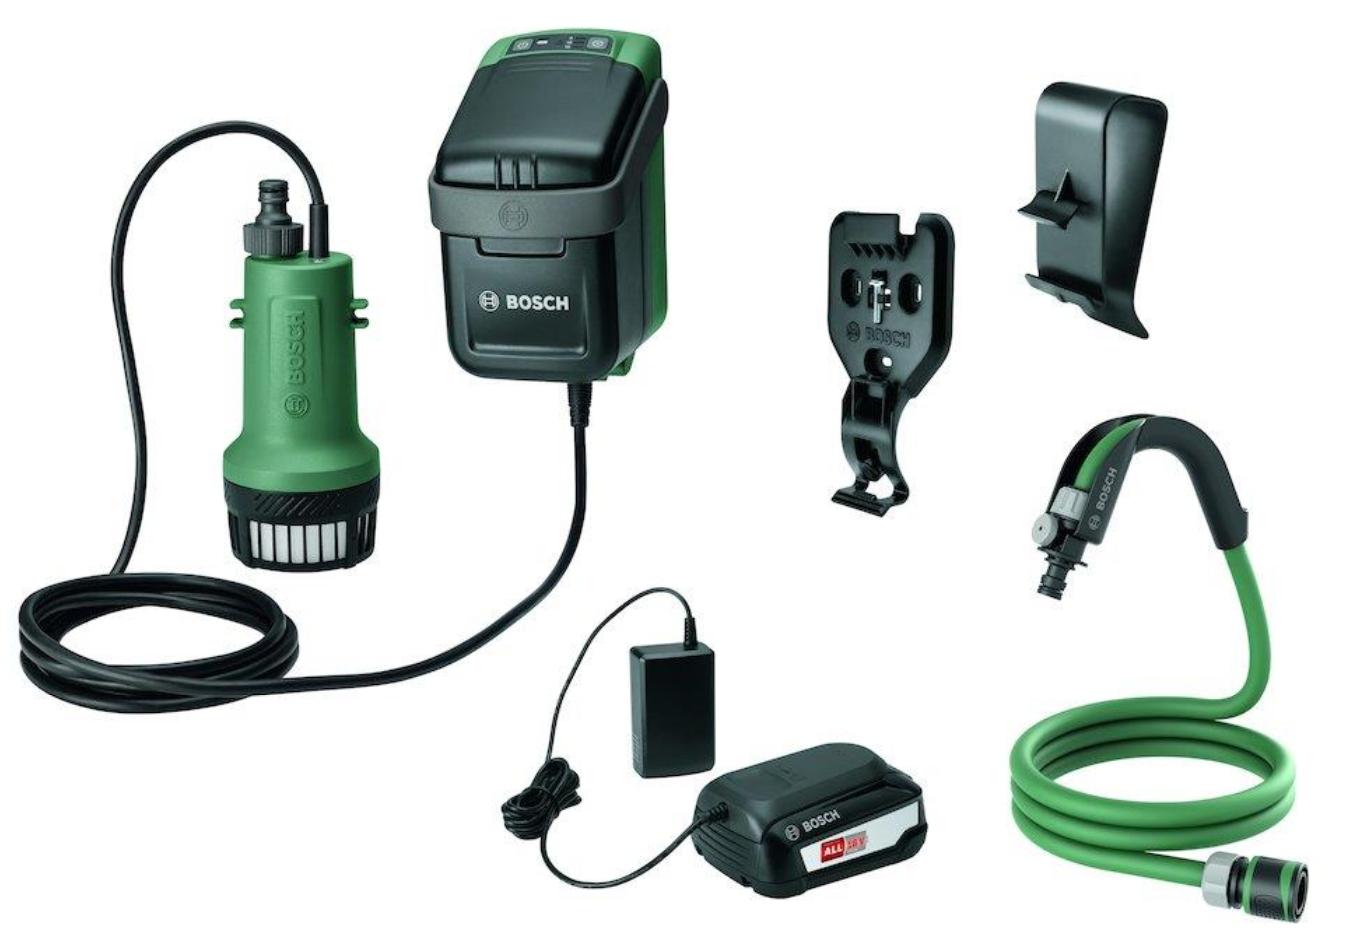 Bosch - Akku Electric Garden Pump 18V Included Battery